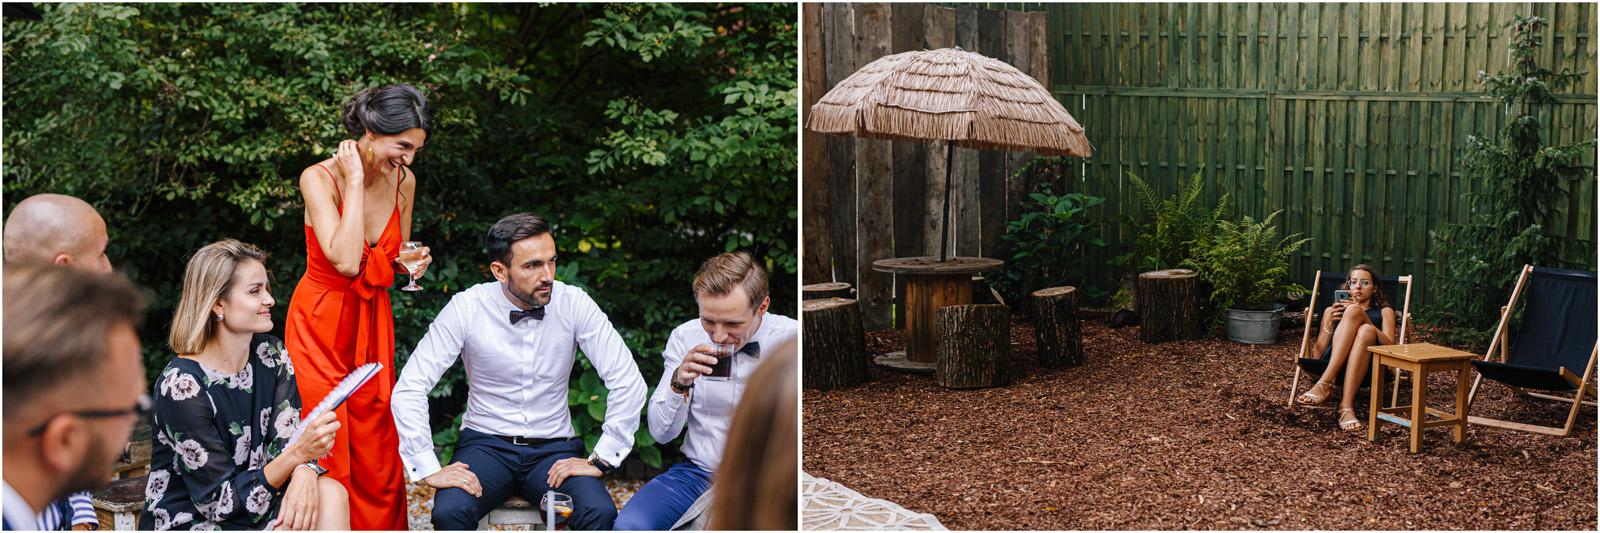 Ania & Mateusz | boho wesele w Stodole pod Kasztanami 96